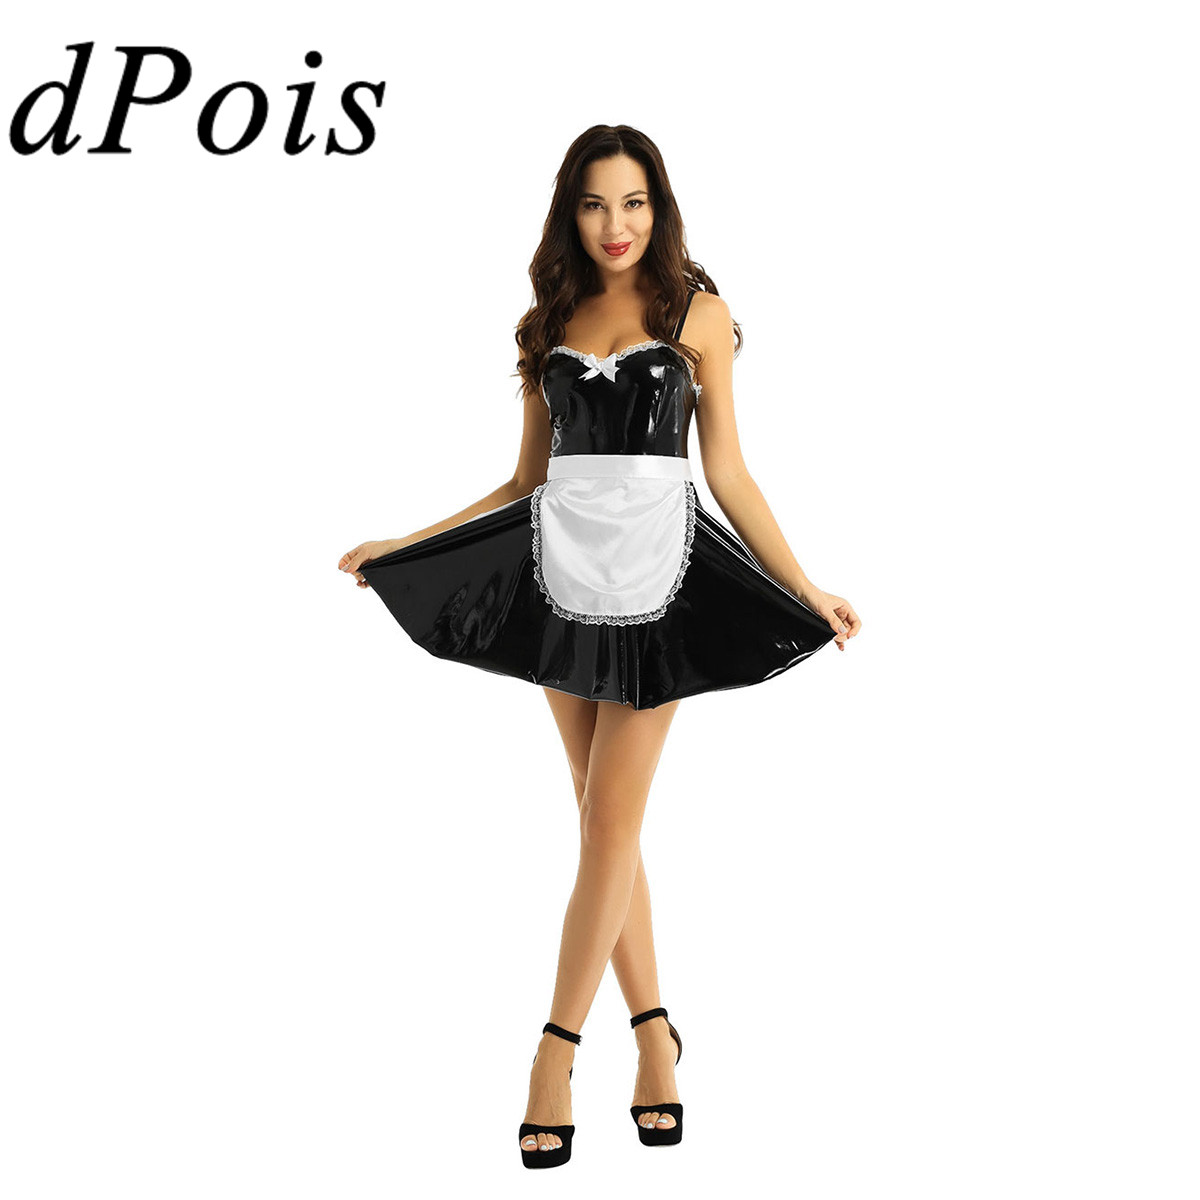 Women School Girl Uniform Outfit Adult Maid Fancy Dress Lingerie Cosplay Costume